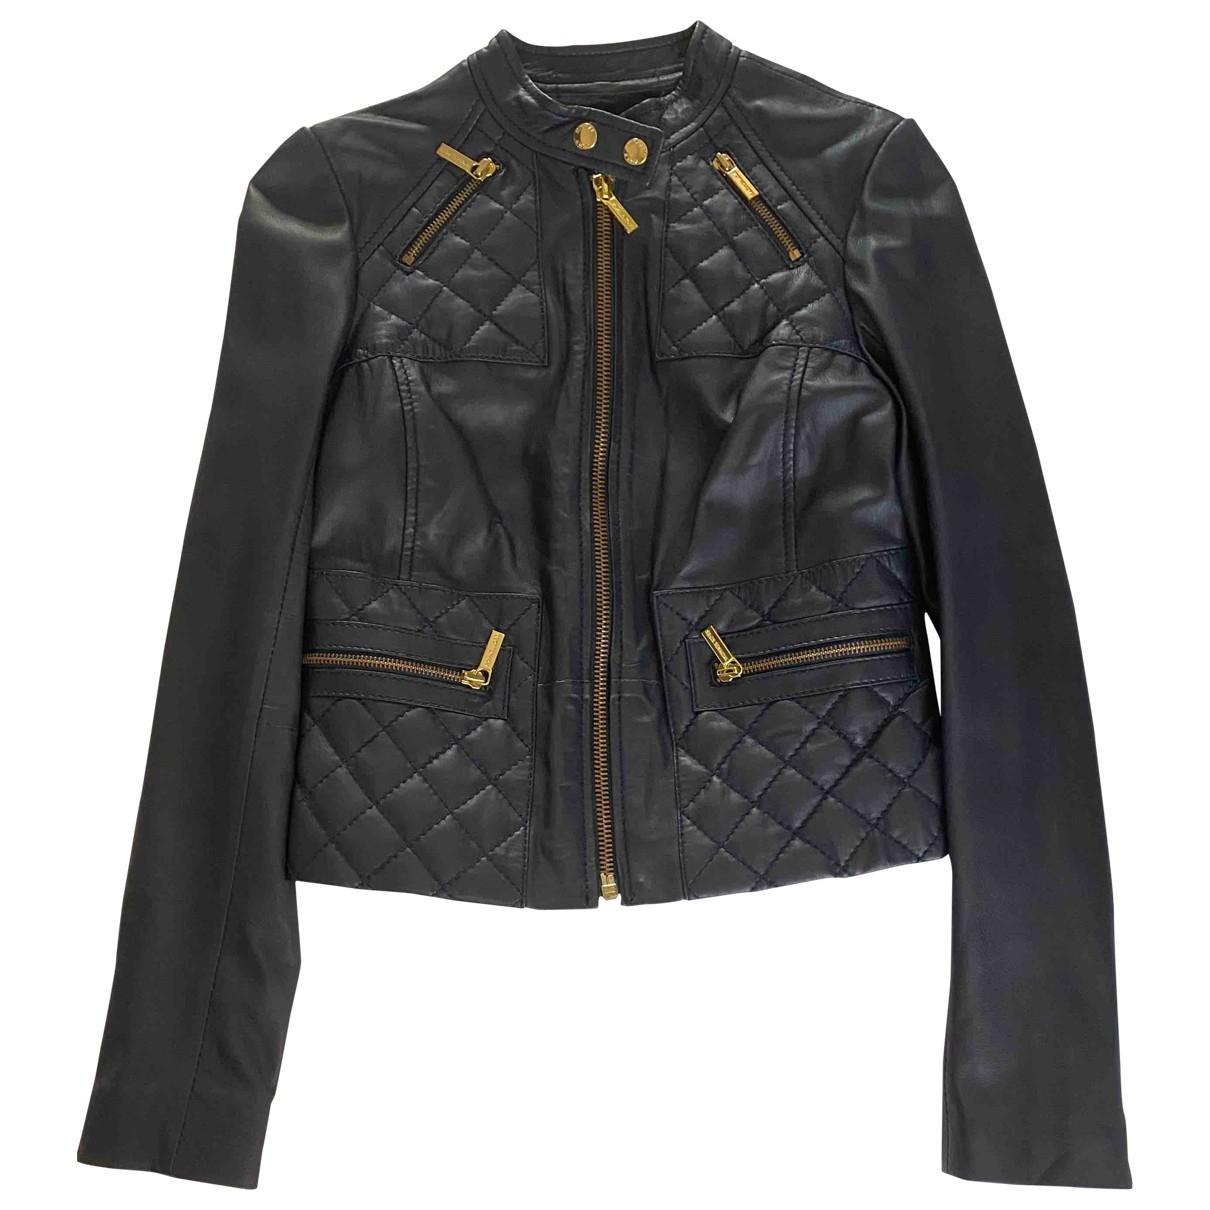 Michael Kors \N Blue Leather jacket for Women XS International